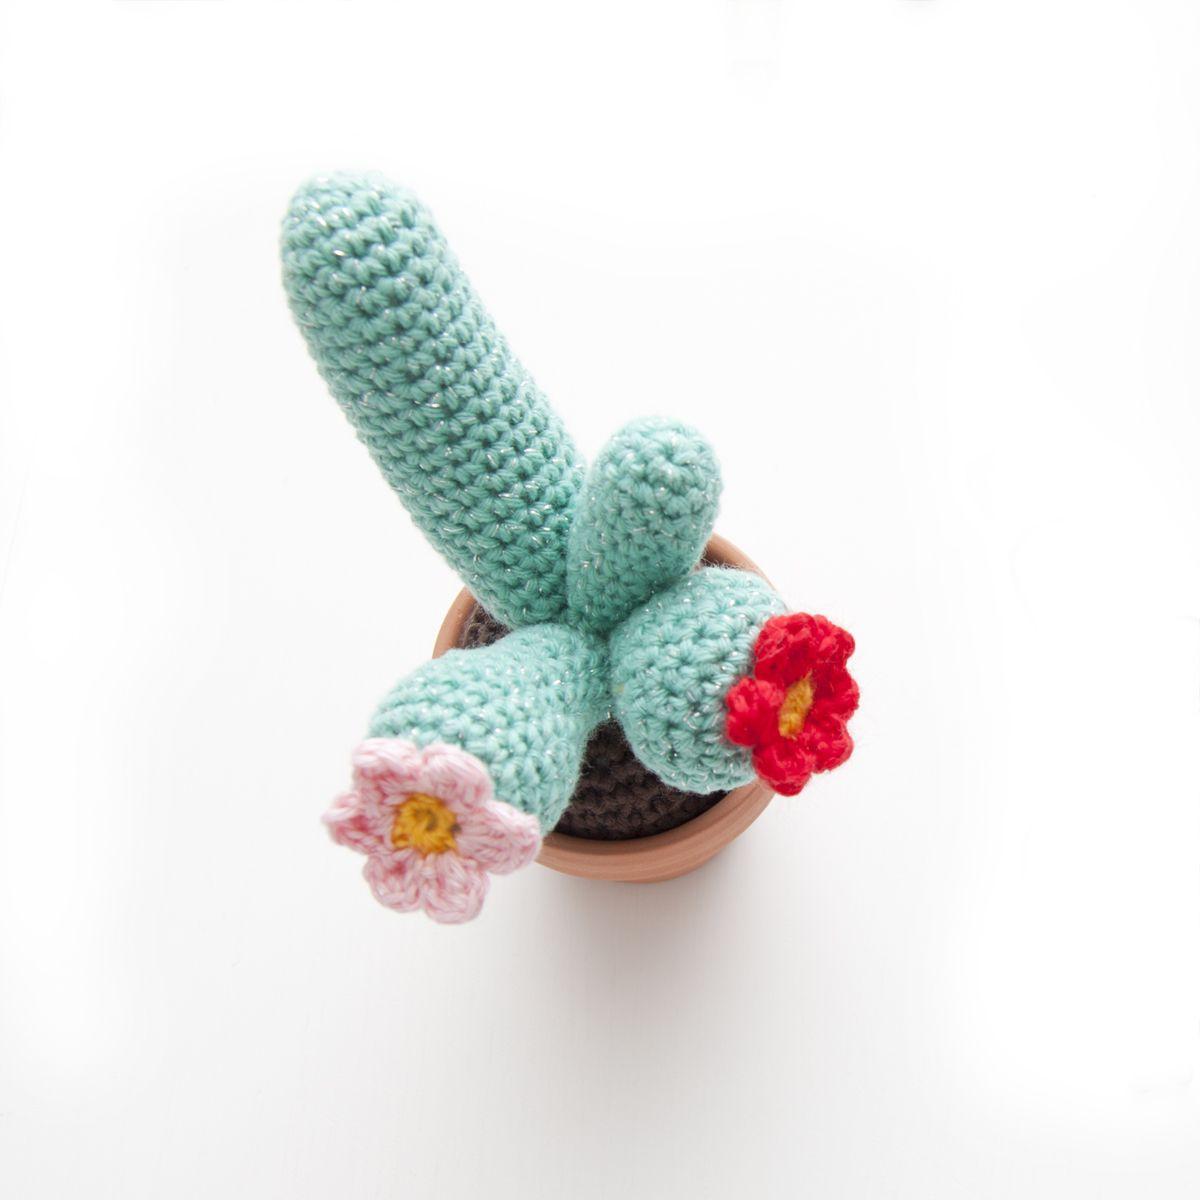 Cactus Amigurumi Free English Pattern   Cactus crochet   Pinterest